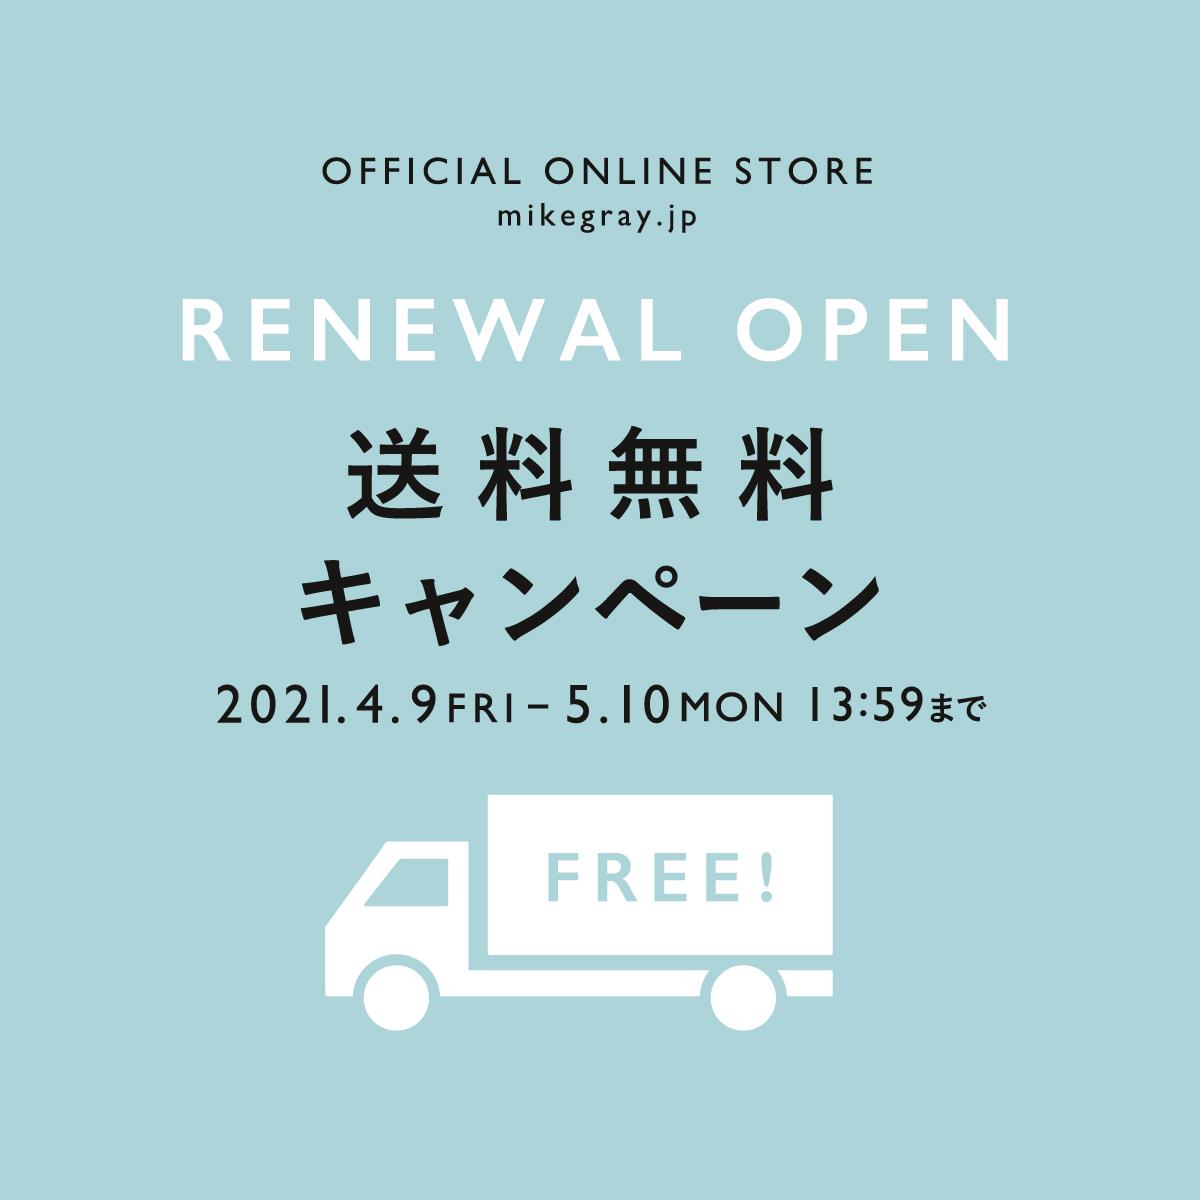 mikegray.jpのリニューアル記念/送料無料キャンペーン!